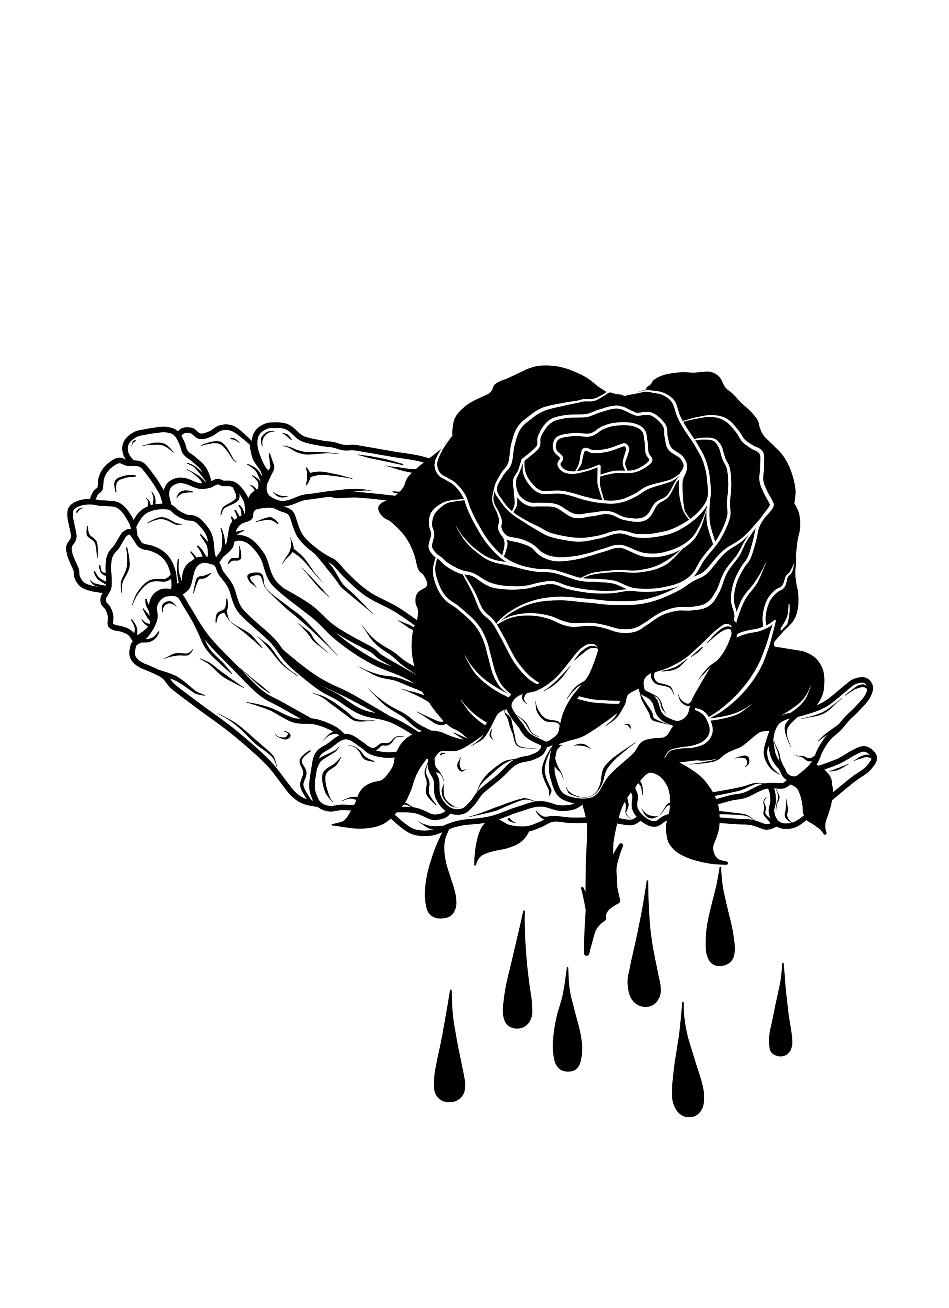 Dead Rose Eskizy Tatuirovok Tatuirovki